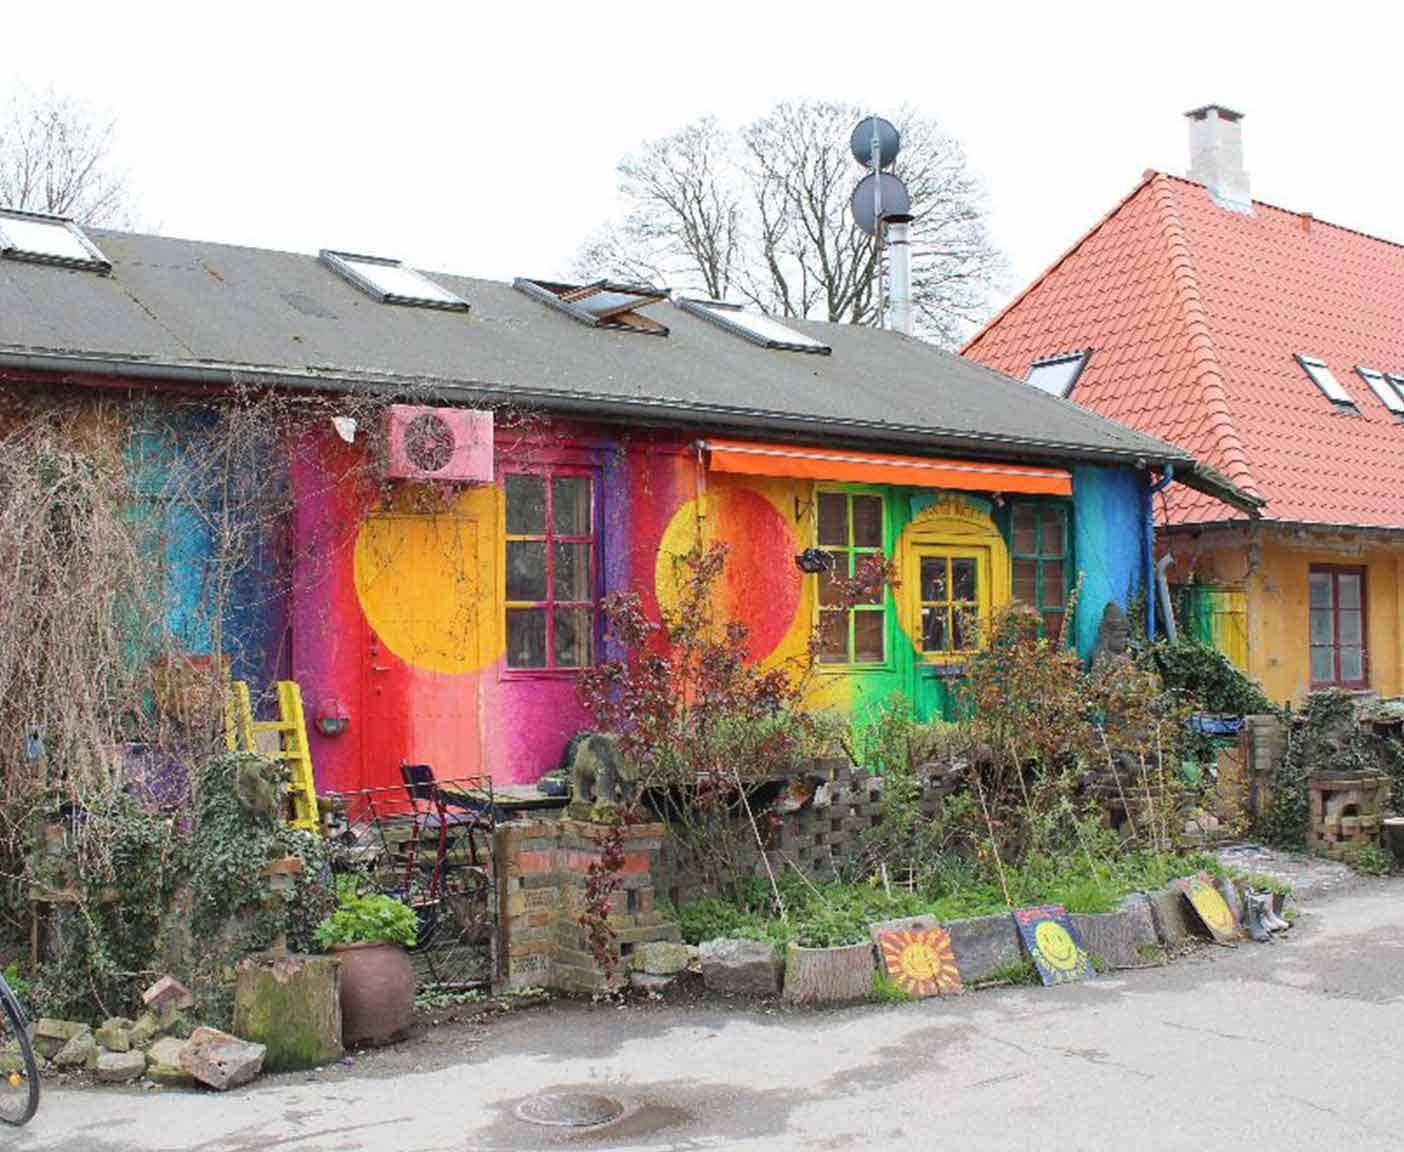 kirstin-daenemark-kopenhagen-cristiania-hippie-kommune-bunte-häuser